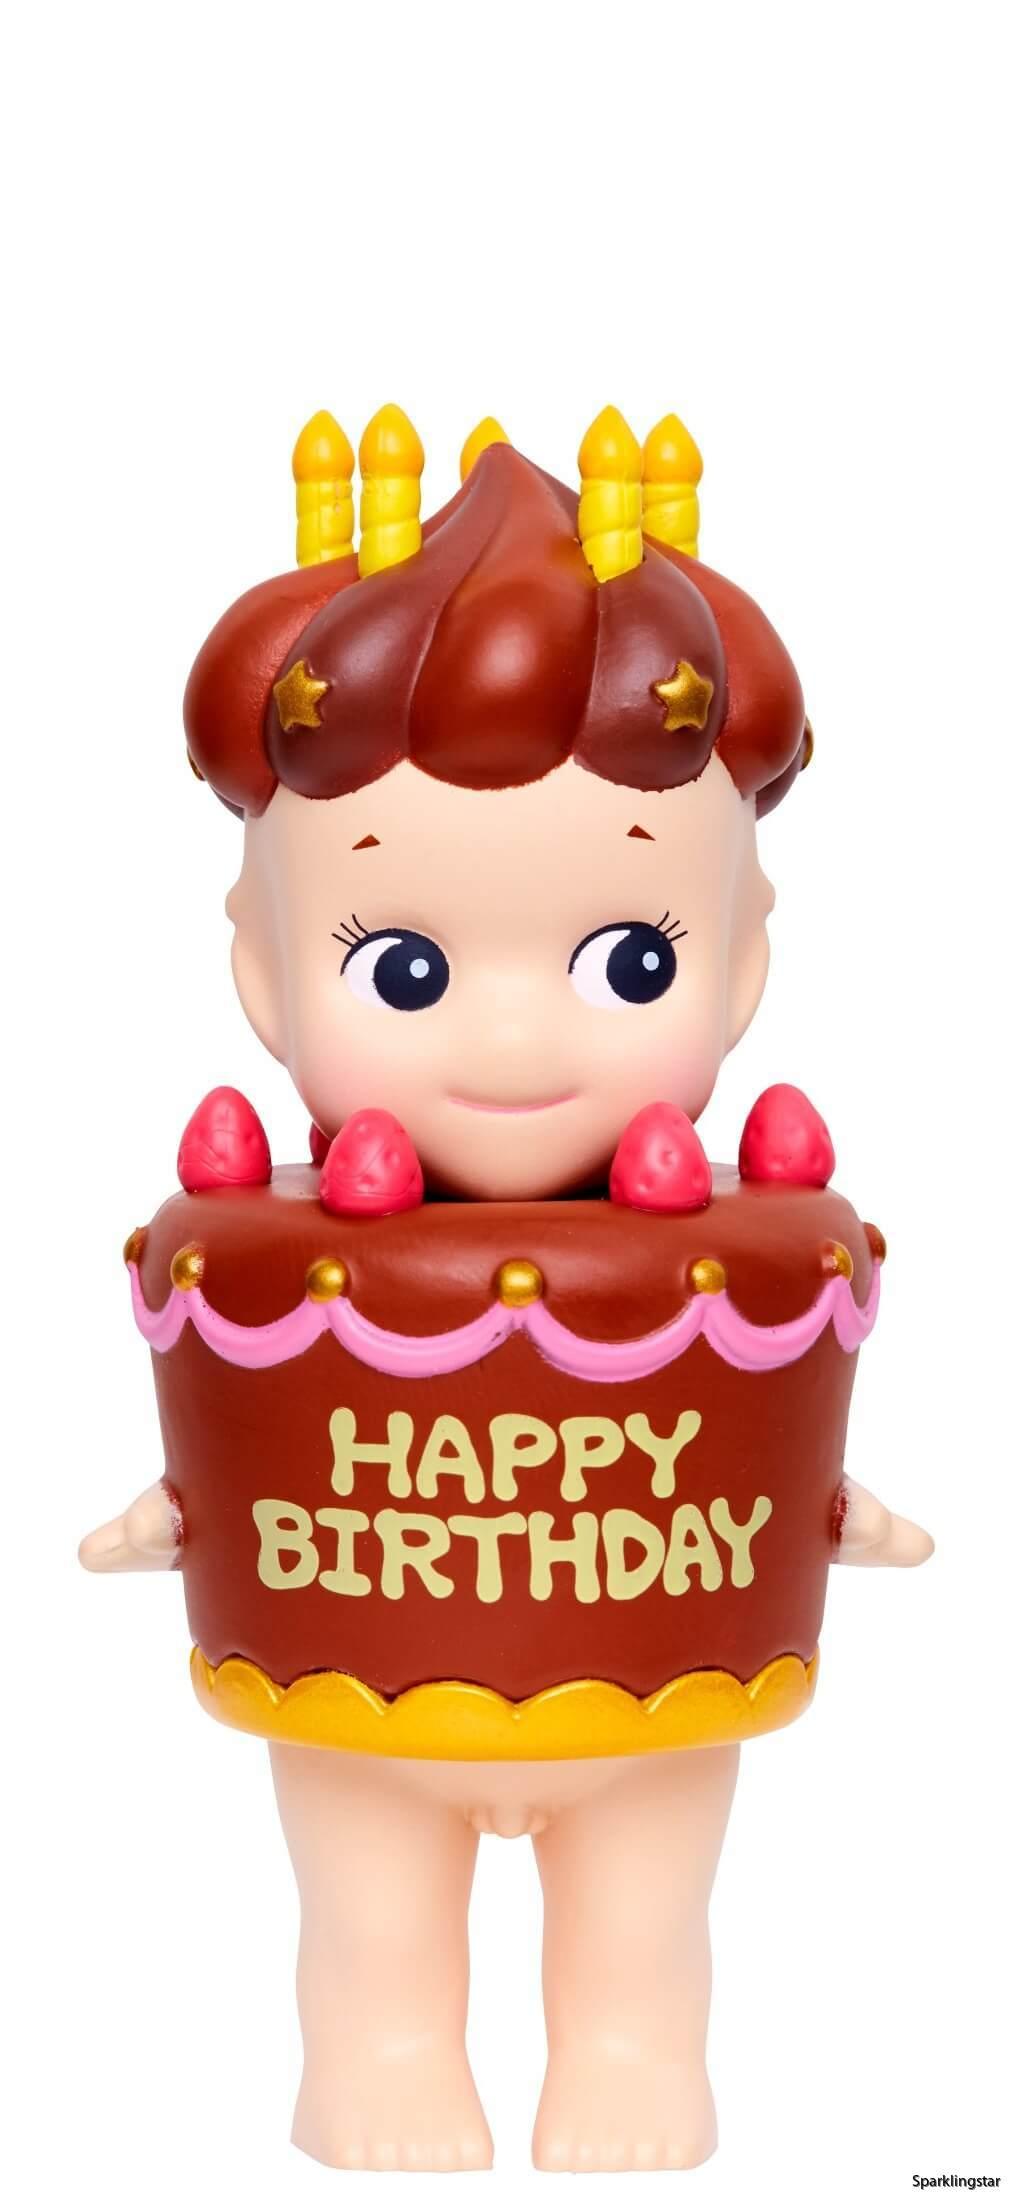 Sonny Angel Birth Day Gift Chocolate Cake